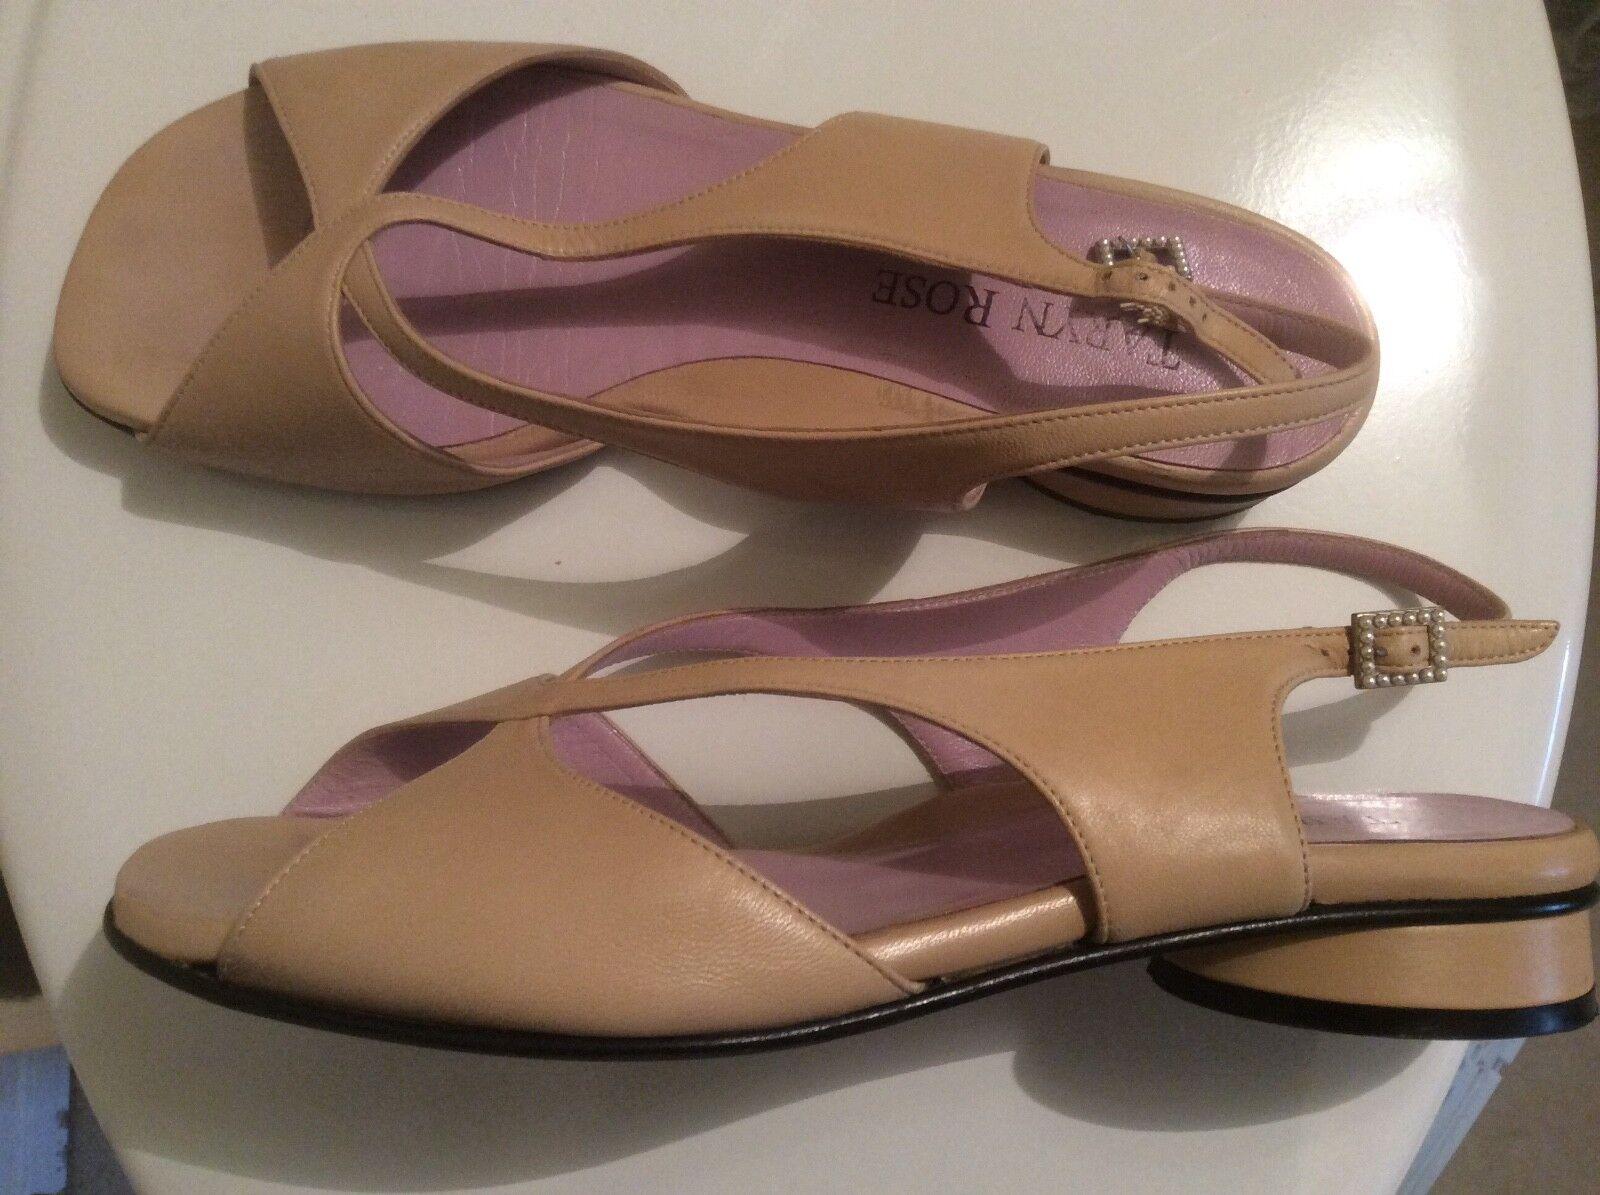 Taryn pink Sandals 38.5 M Beige slingback pearl buckle sandals EUC